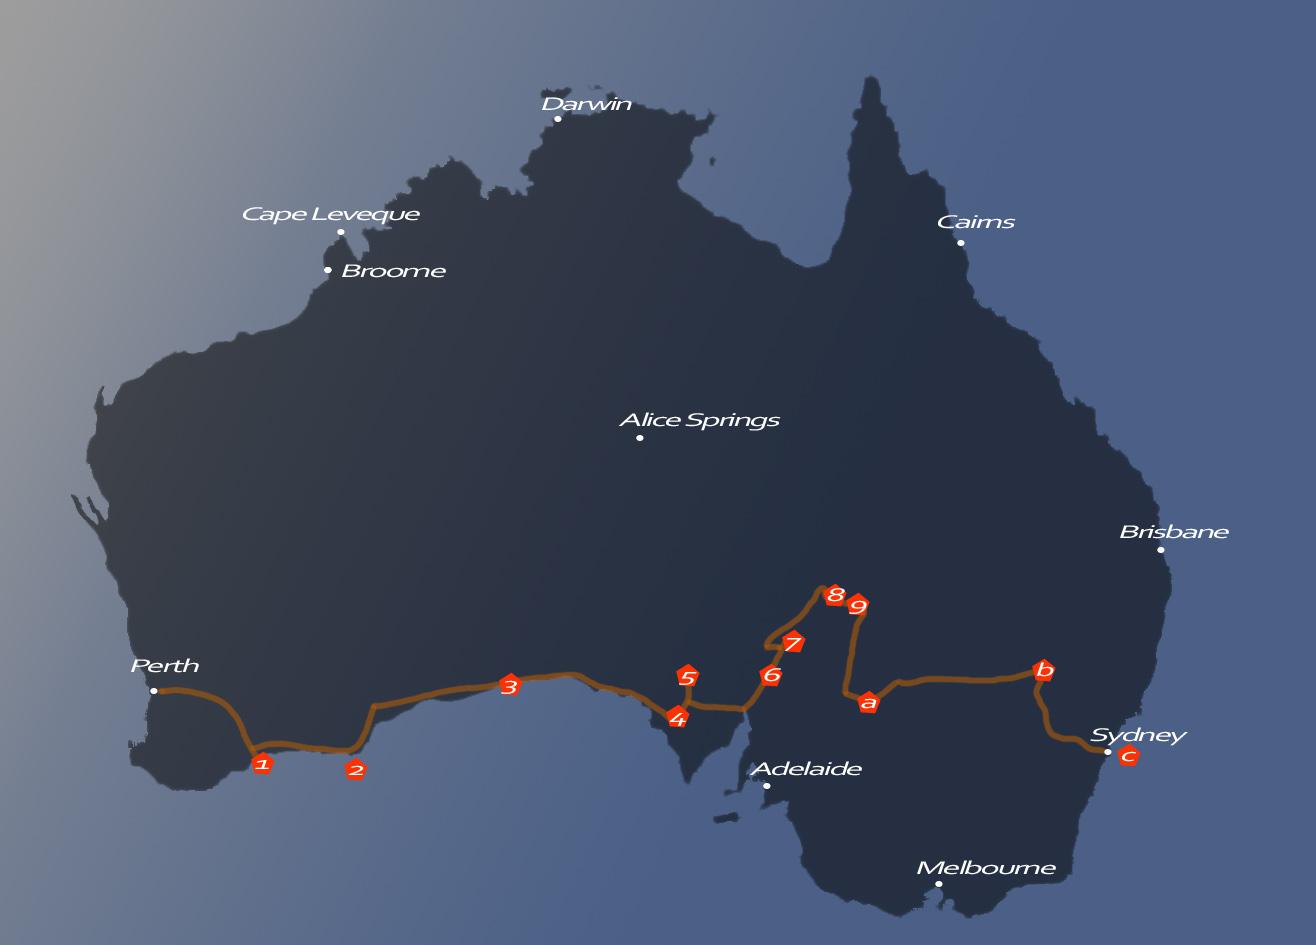 Australienmap_Perth_Sydney